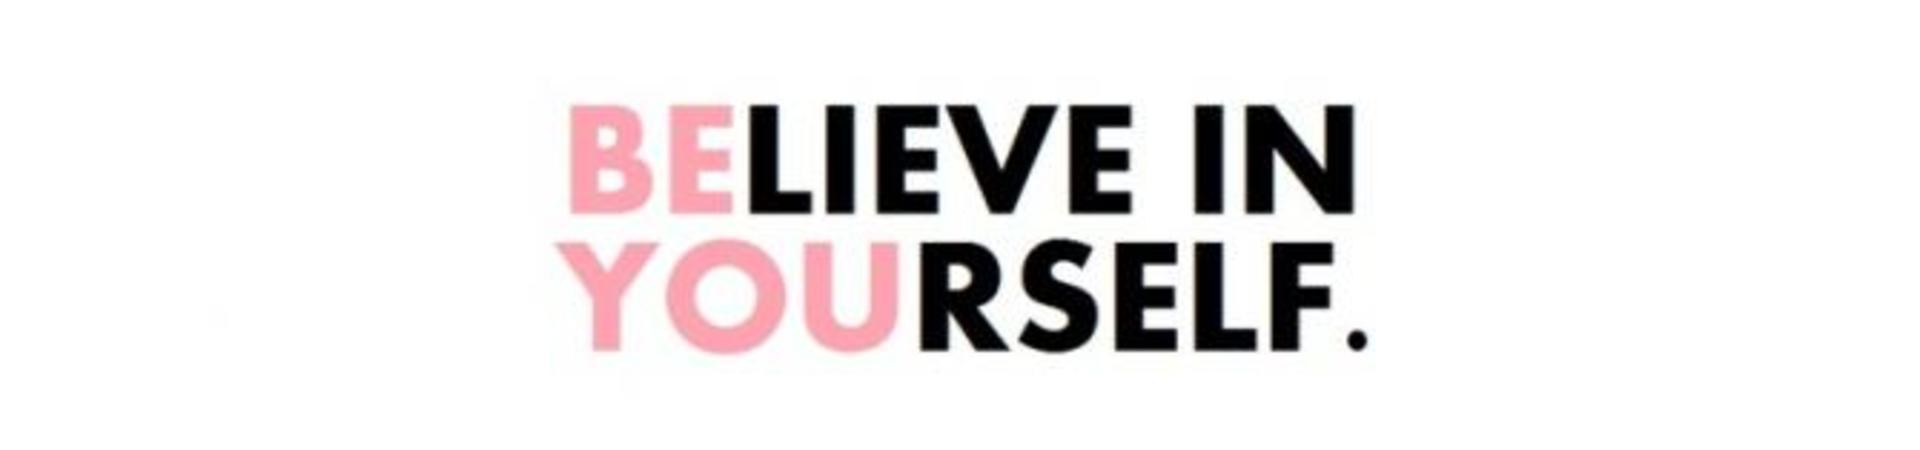 Believe in ur self facebook cover